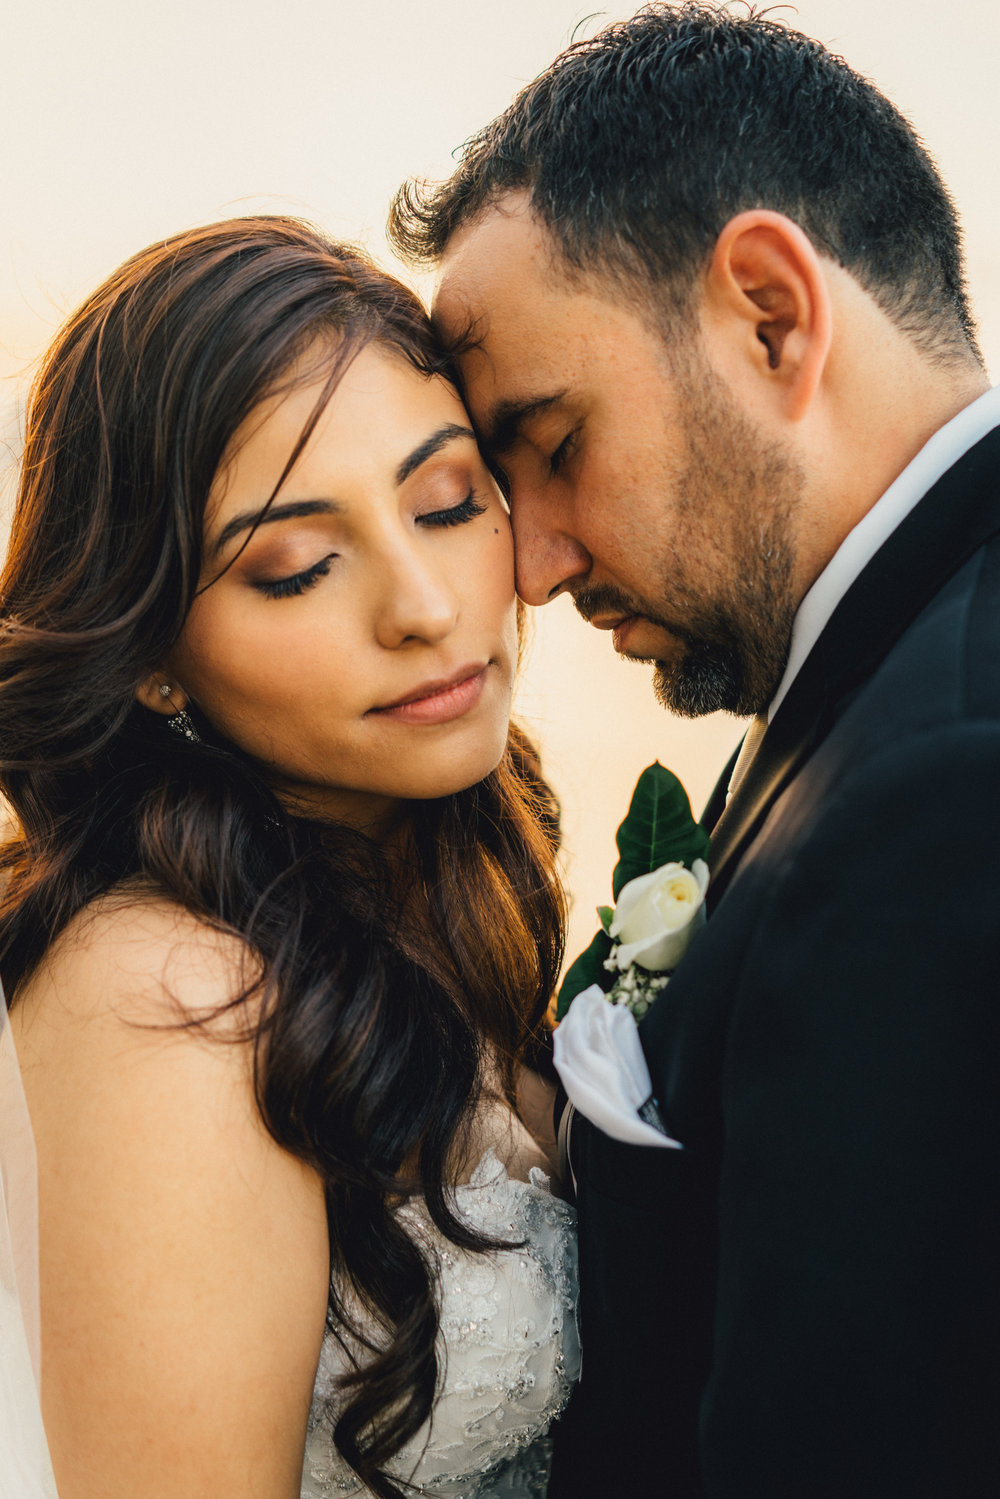 Mike_Steinmetz_Virginia_Wedding_Photographer_Favorites-29.jpg